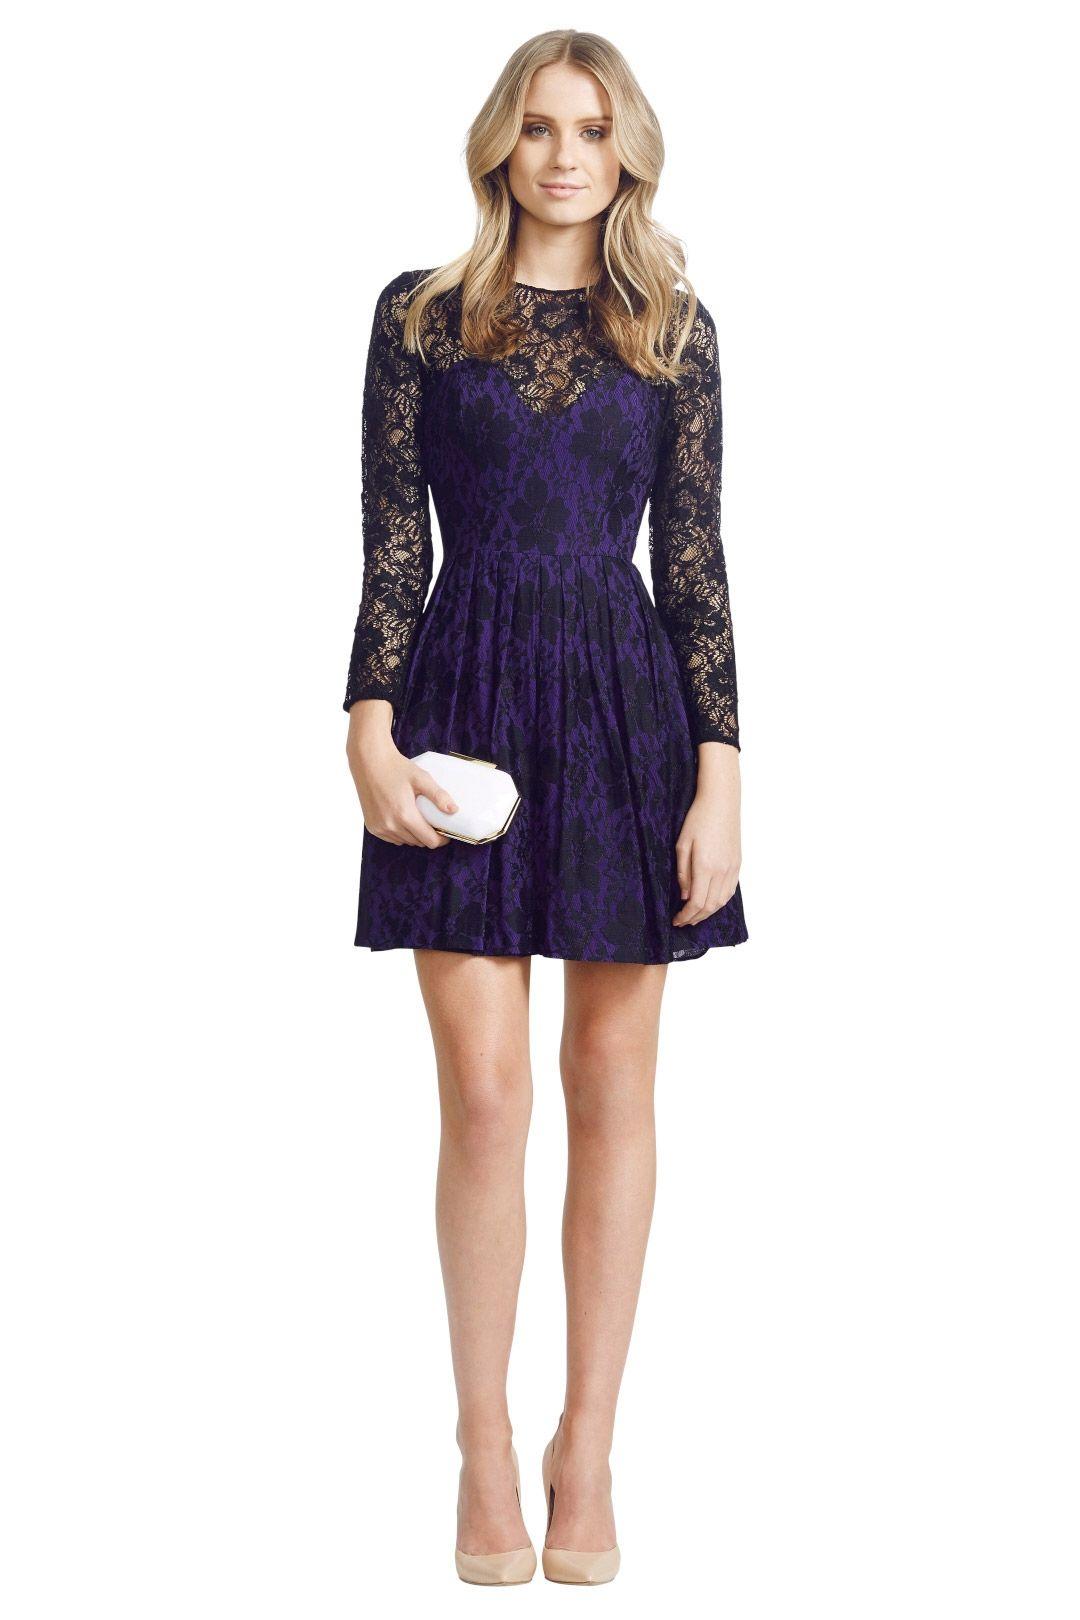 Jayson Brunsdon - Mimi Dress - Purple - Front